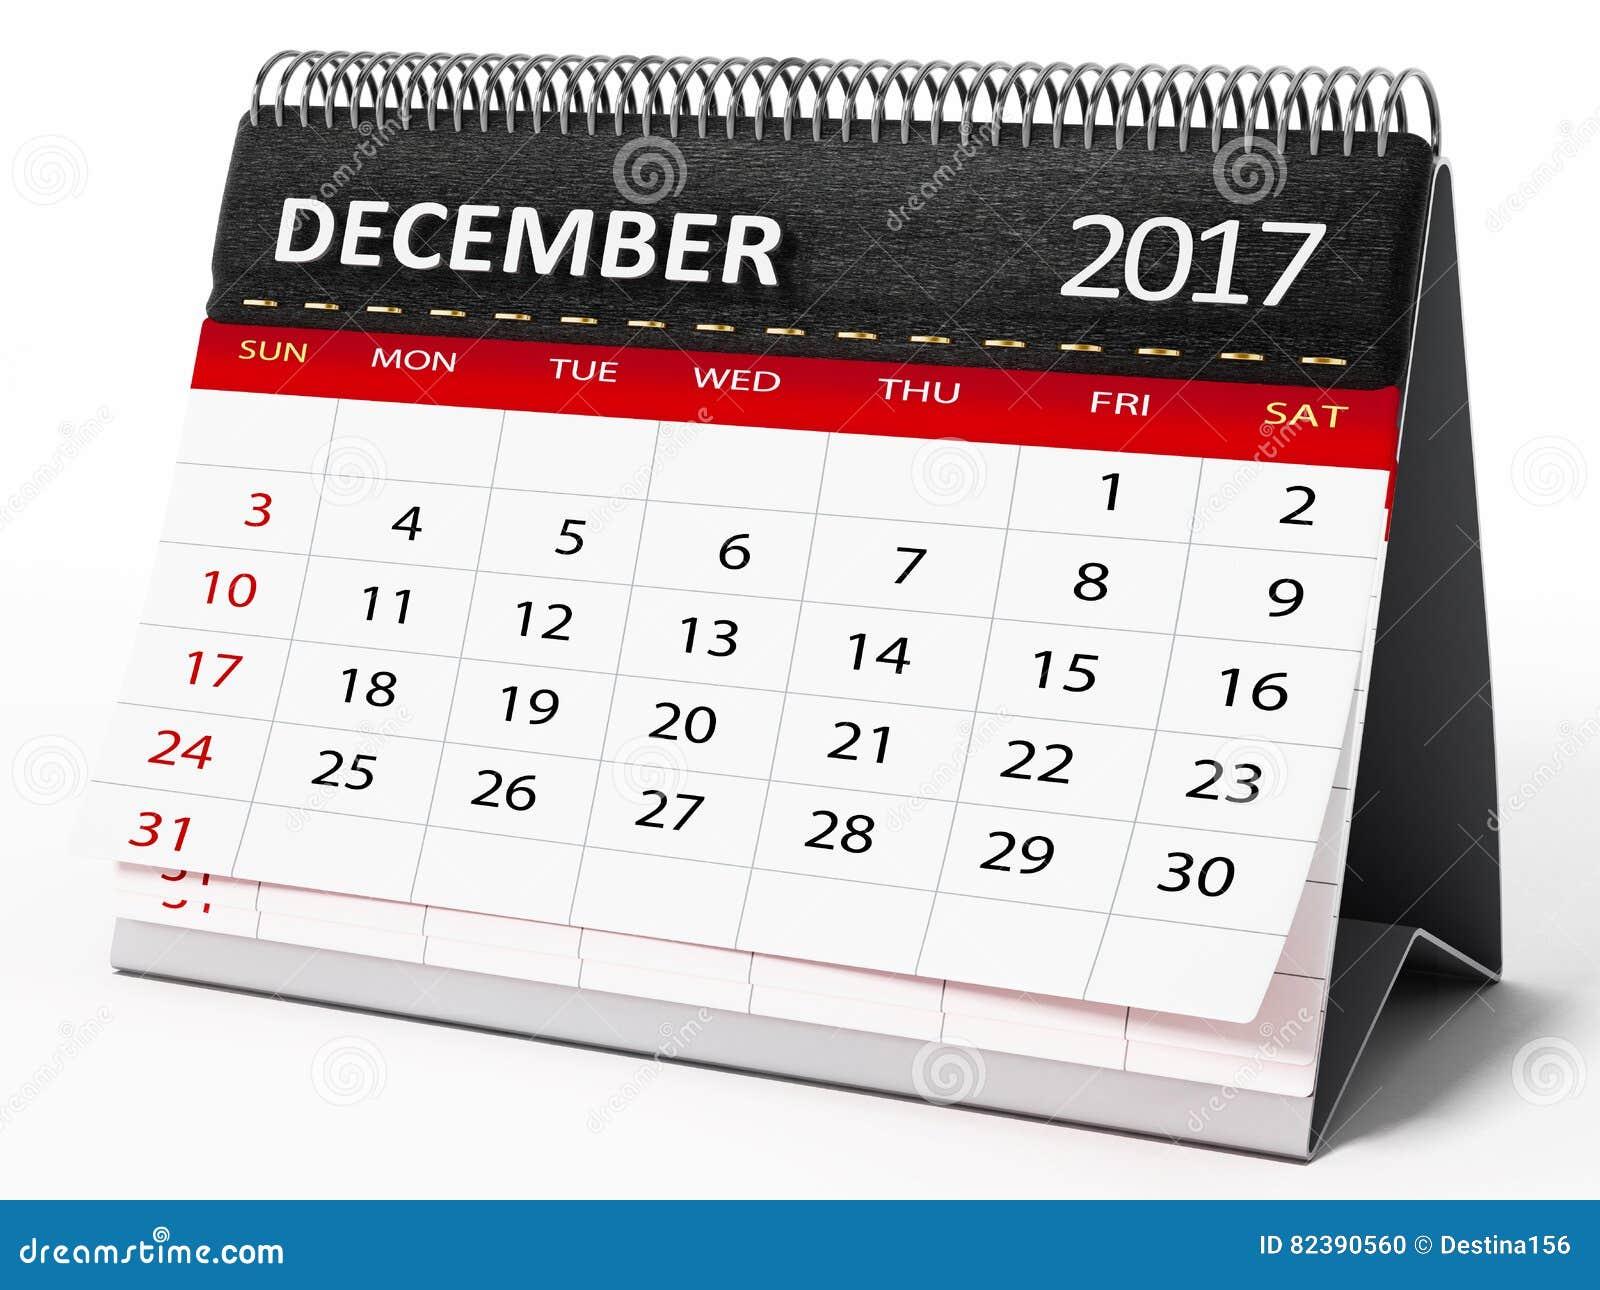 December 2017 desktop calendar. 3D illustration